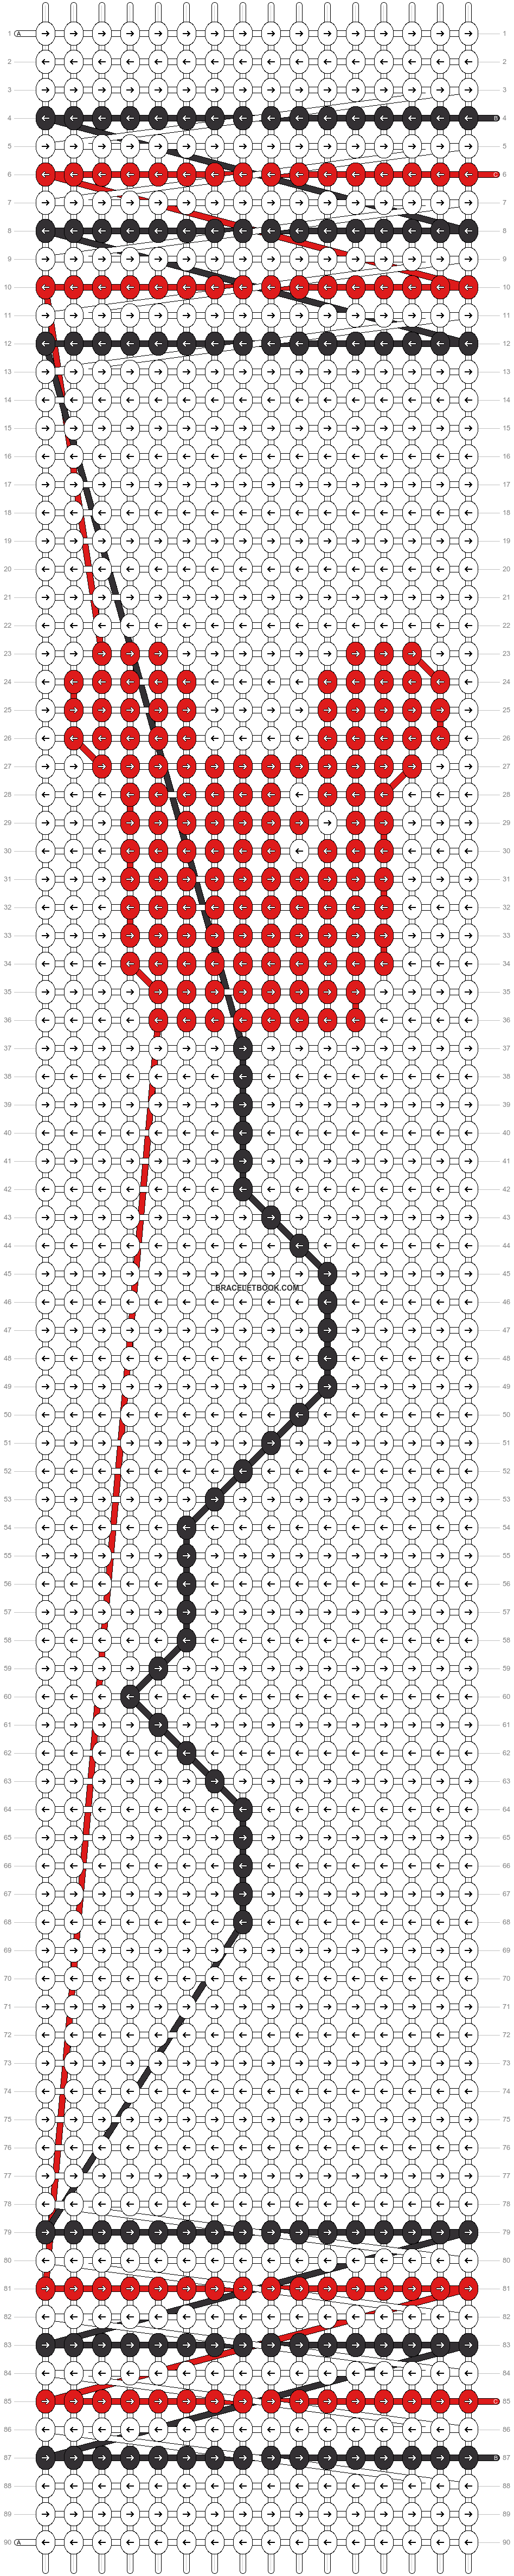 Alpha Pattern #21848 added by razcarate